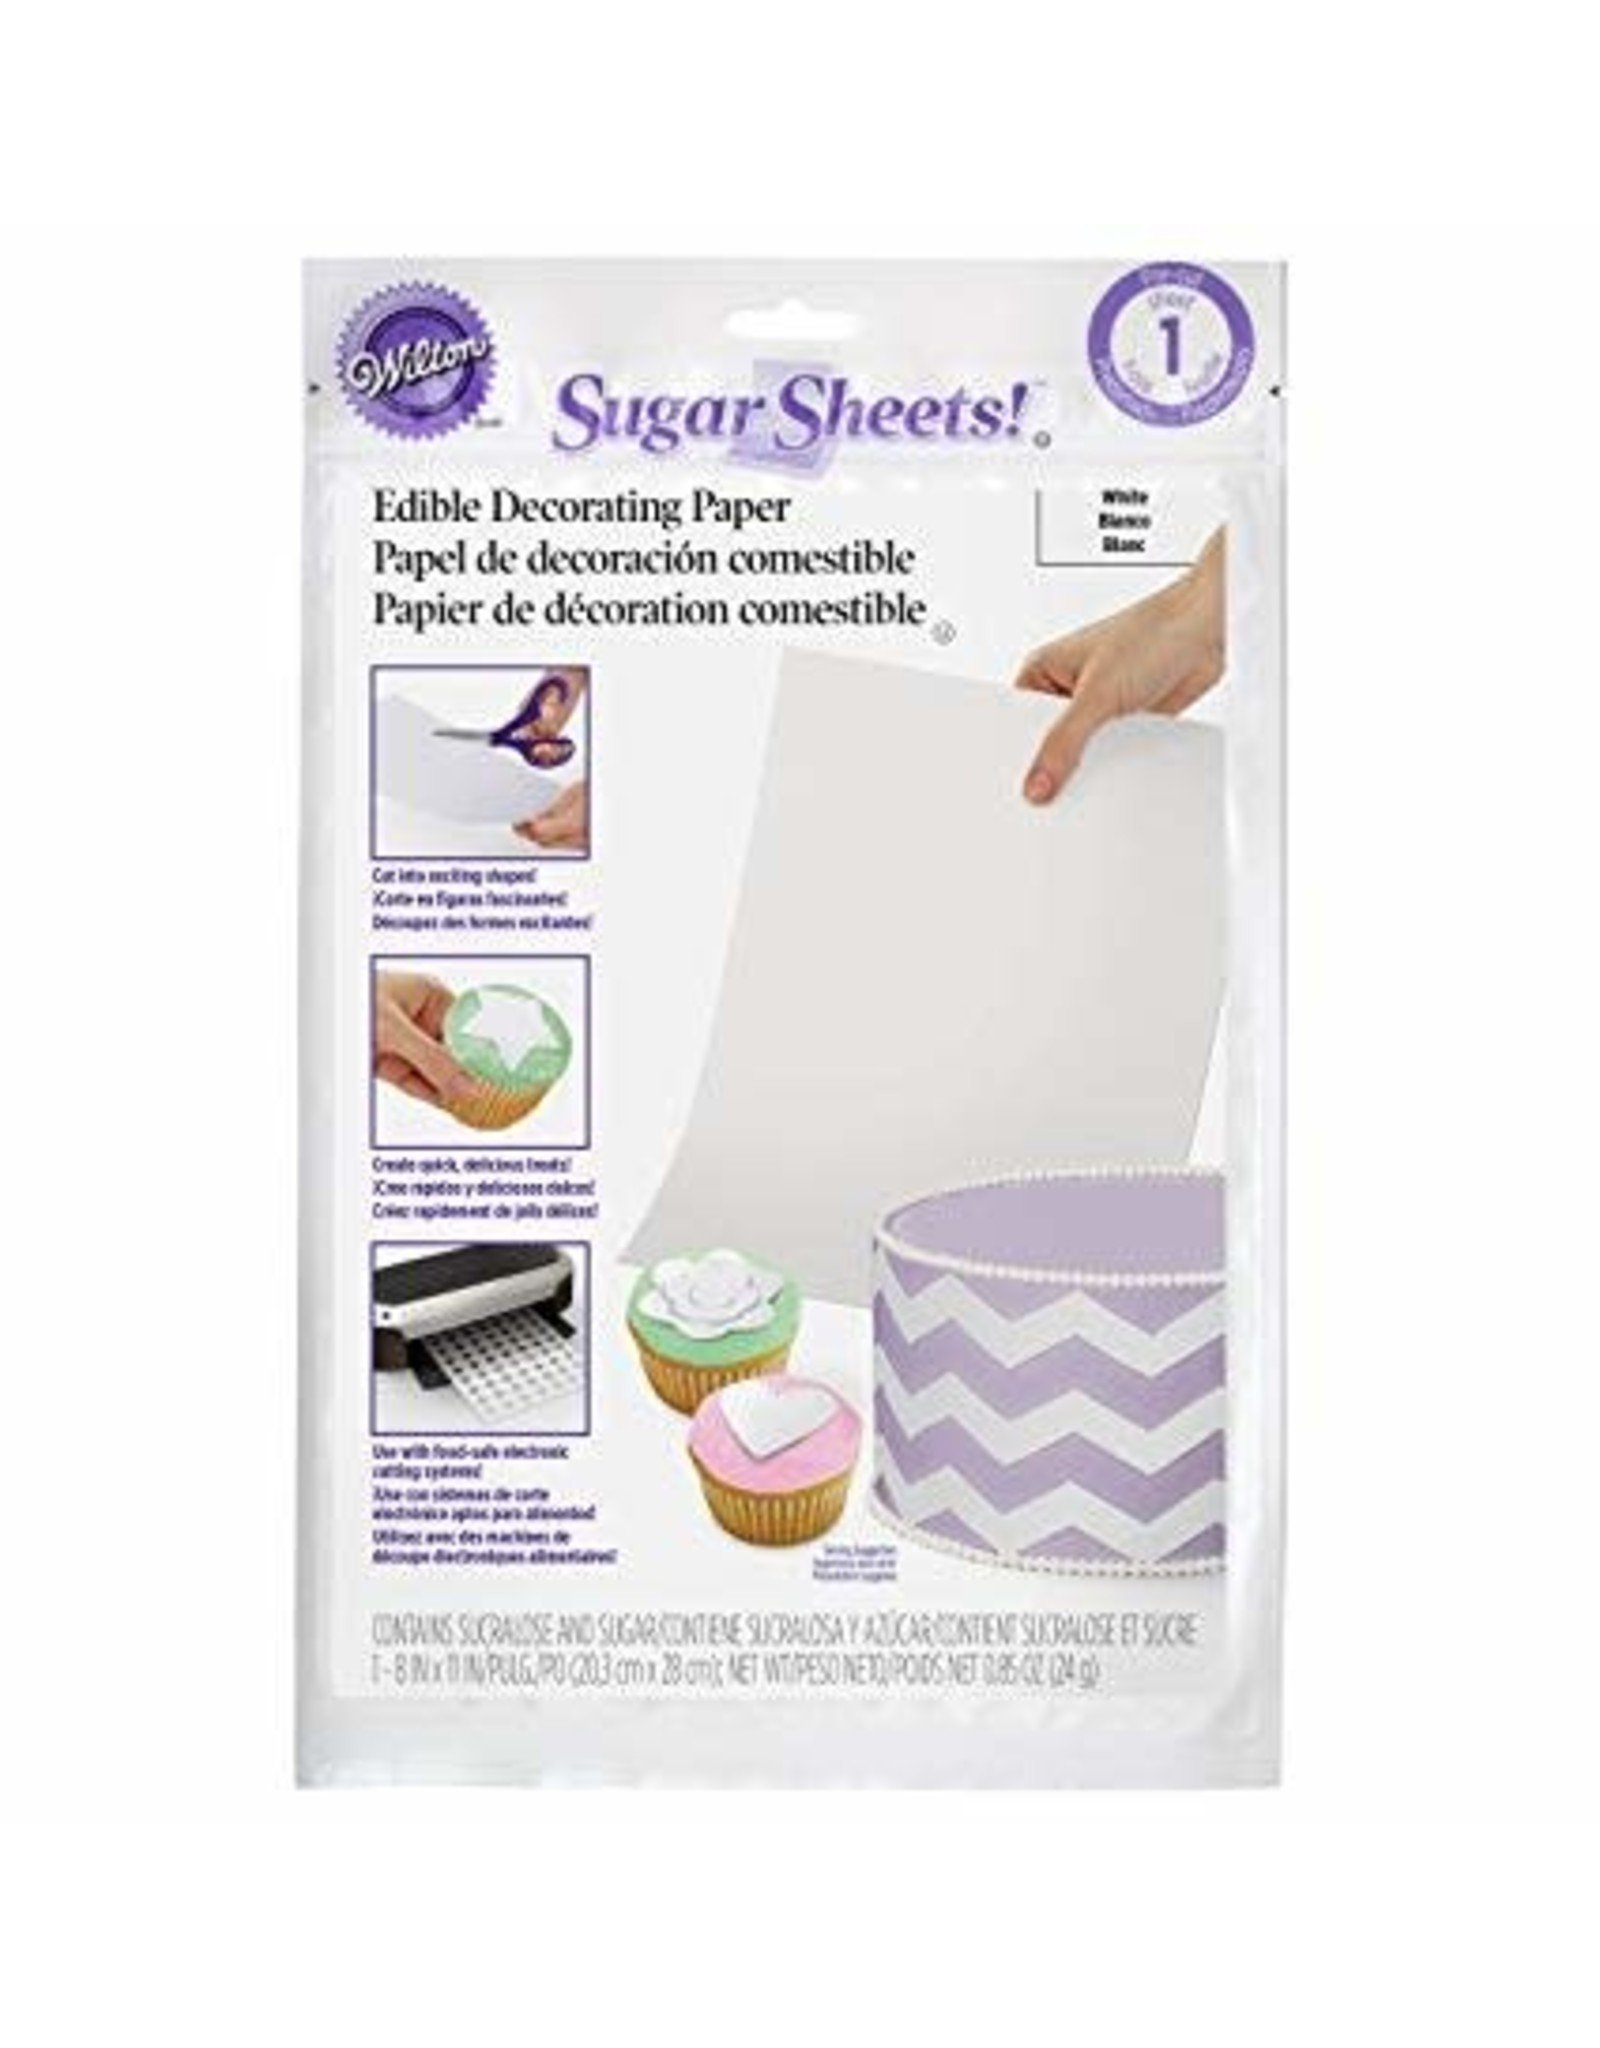 Wilton Wilton White Sugar Sheets Edible Decorating Paper - 0.85 oz.